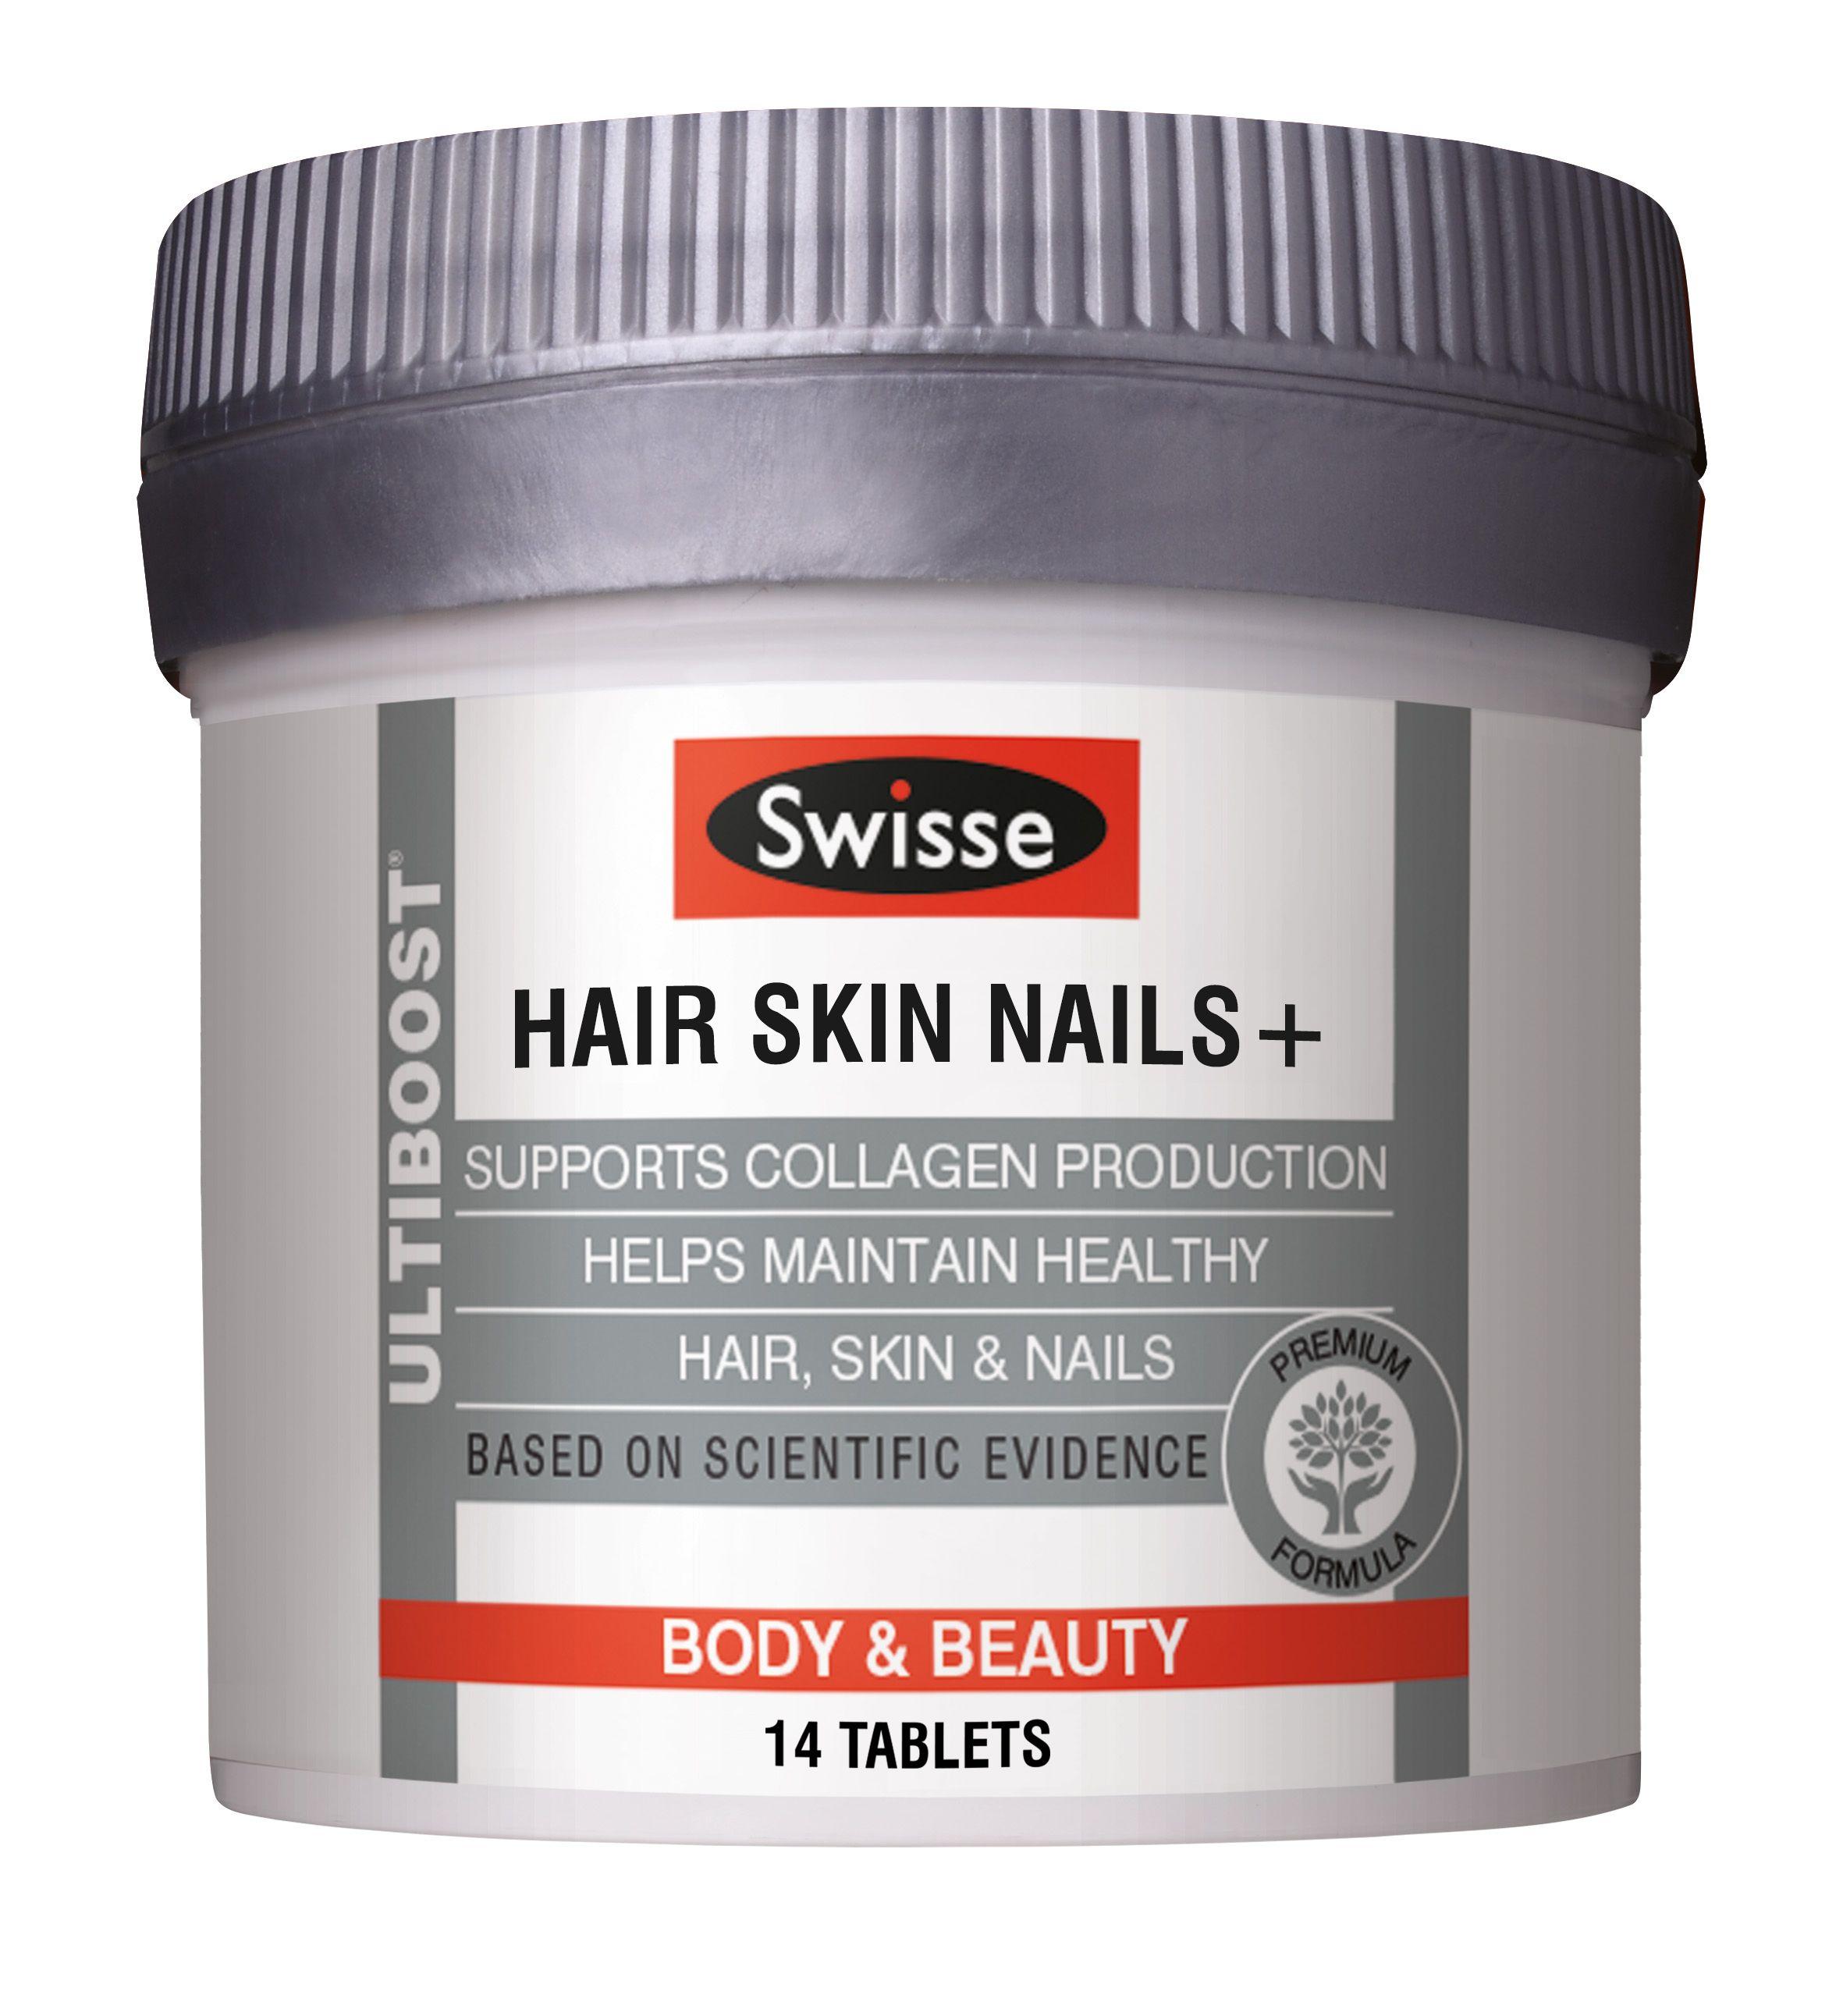 Swisse Ultiboost Hair Skin Nails Tablets Redmart With Images